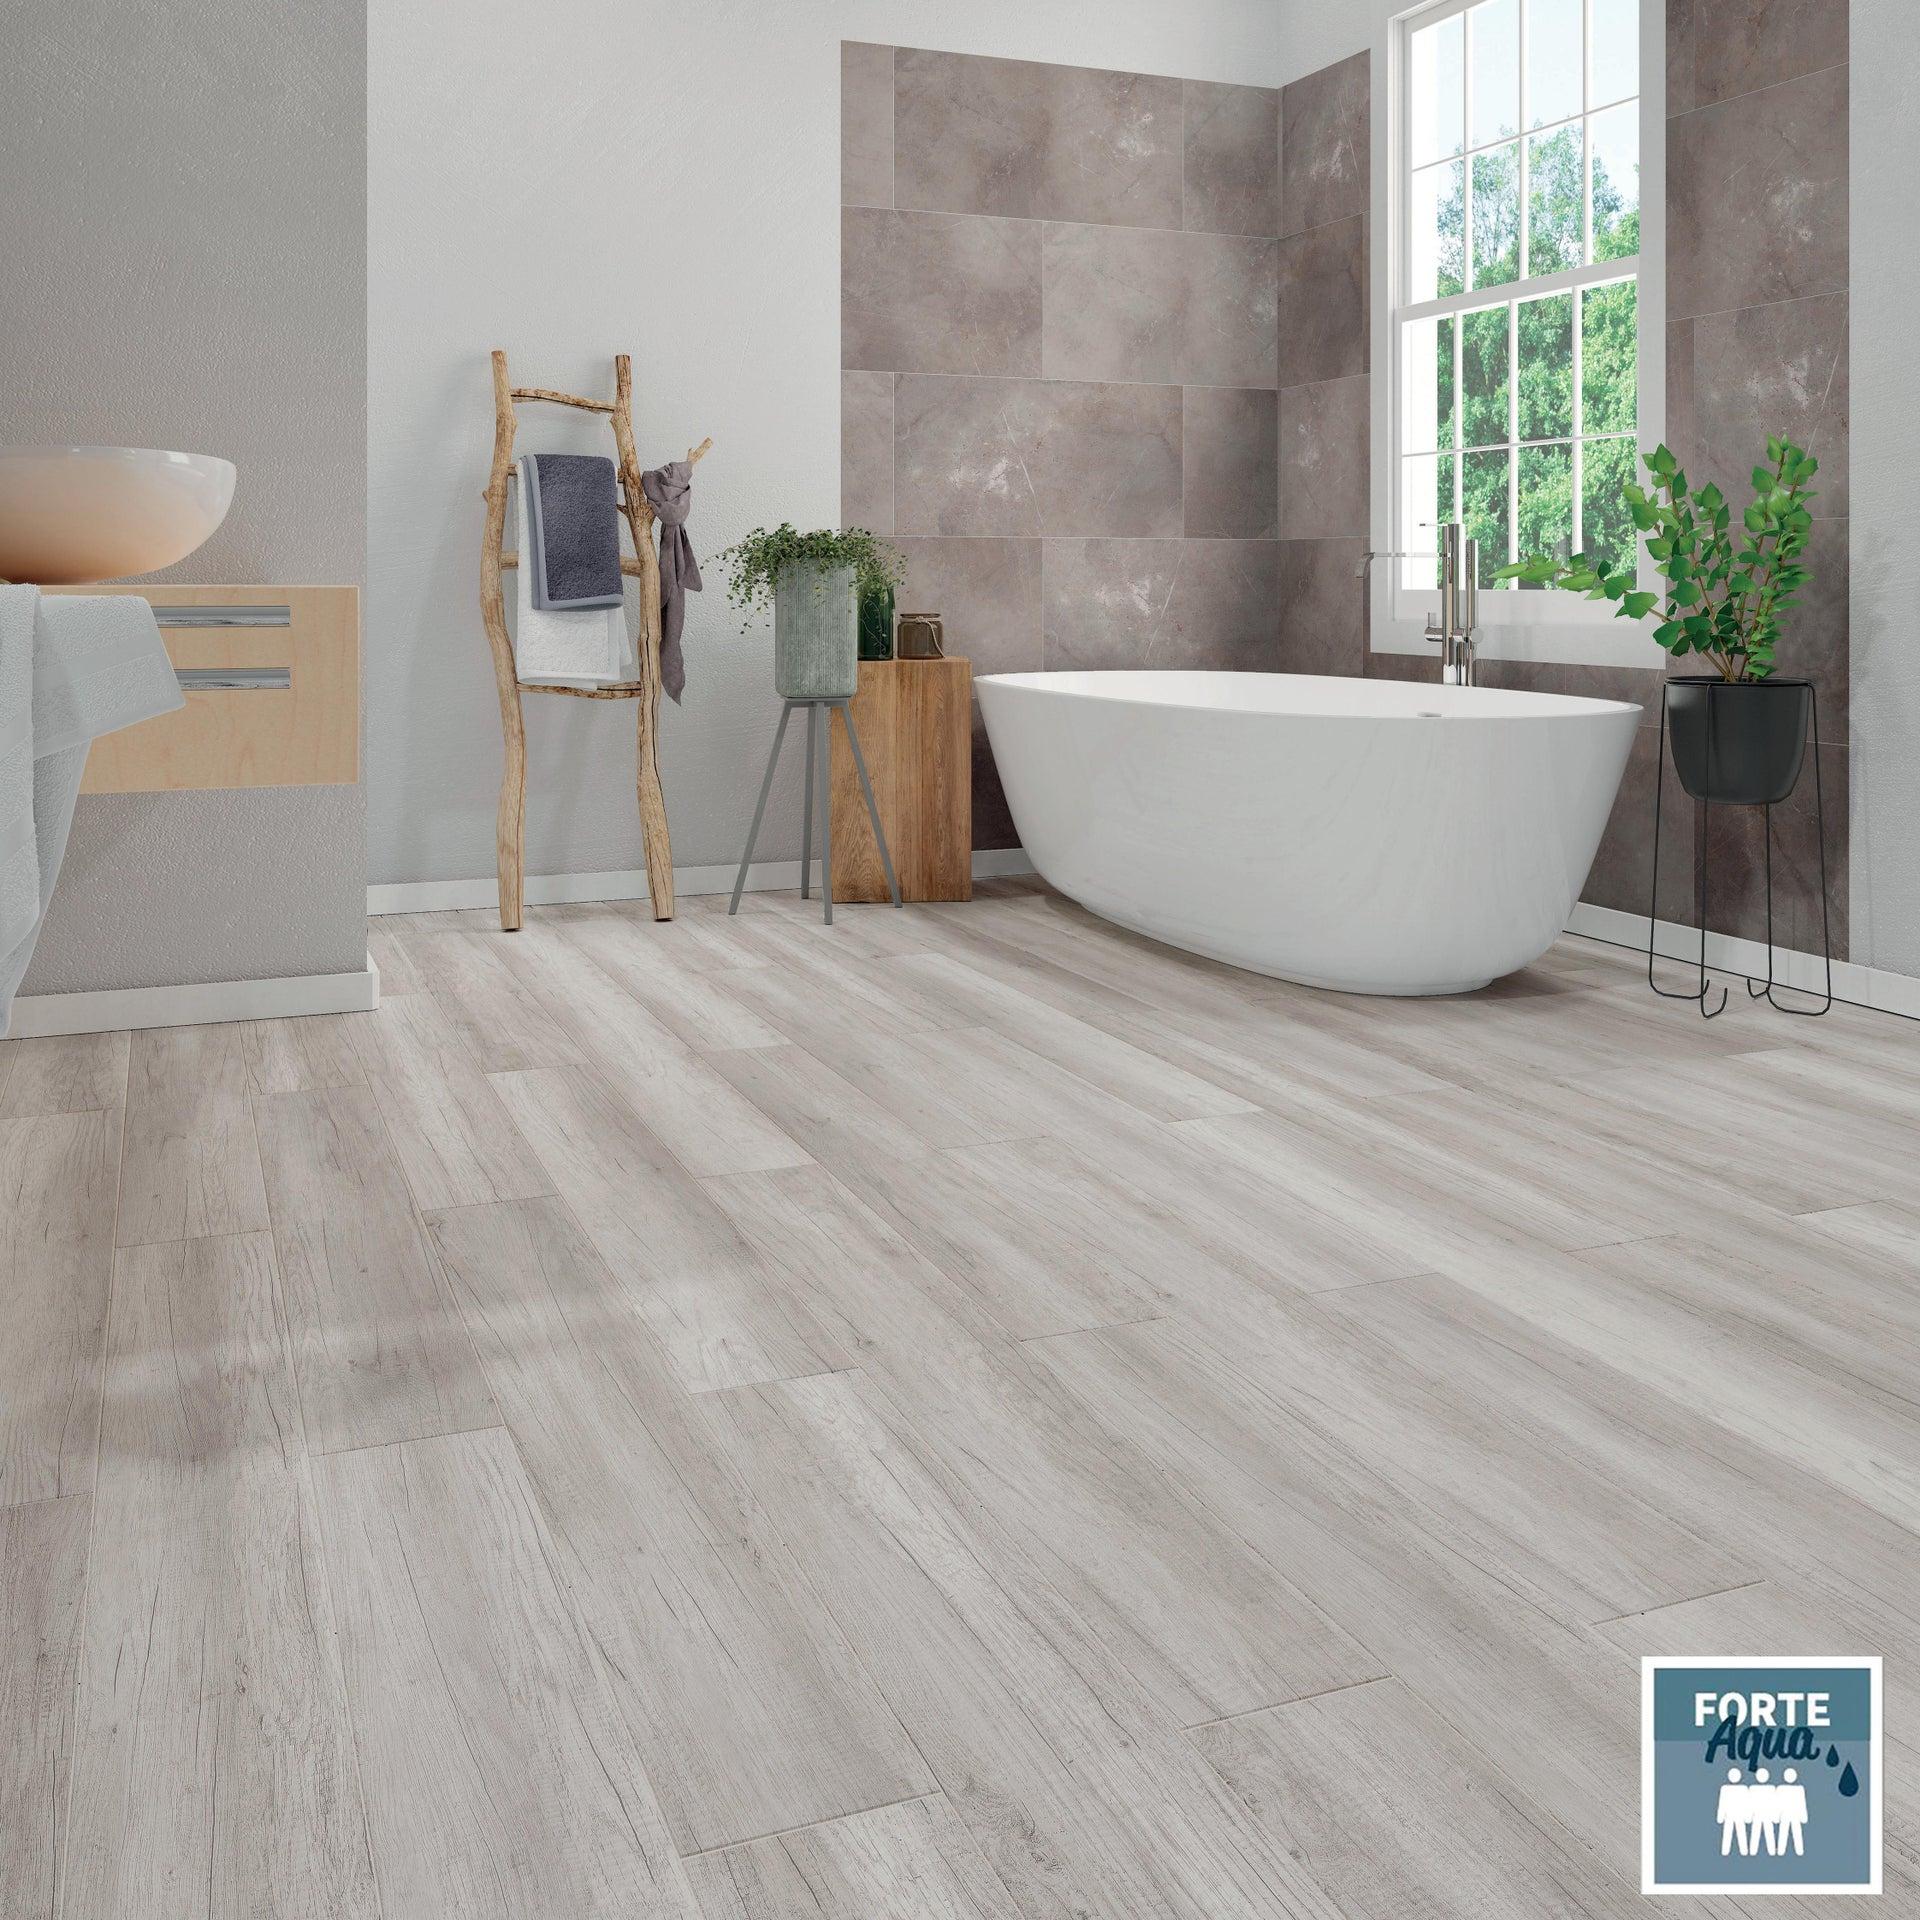 Pavimento laminato H2O Oak Sp 8 mm grigio / argento - 2